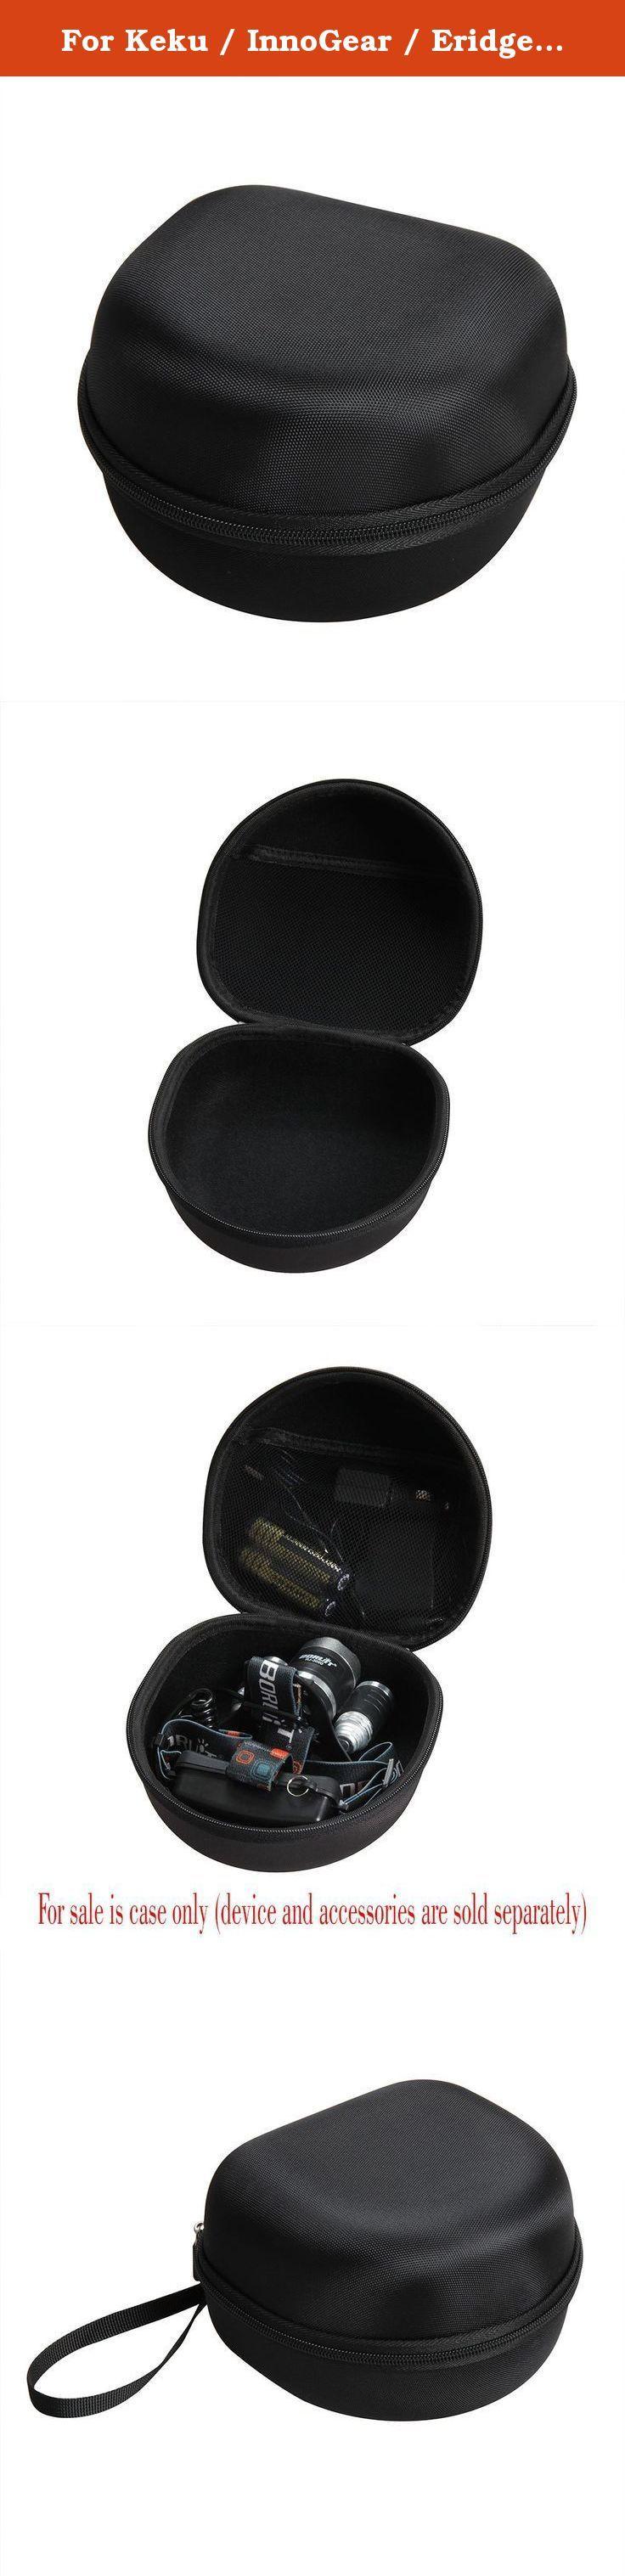 For Keku / InnoGear / Eridge / OUTERDO / Boruit RJ-3000 LED High Power 5000 Lumen Bright Headlight Headlamp Rechargeable Head Flashlight Lamp Hard EVA Travel Case Carrying Bag by Hermitshell. For Keku / InnoGear / Eridge / OUTERDO / Boruit RJ-3000 LED High Power 5000 Lumen Bright Headlight Headlamp Rechargeable Waterproof Head Flashlight Lamp Hard EVA Protective Case Carrying Pouch Cover Bag by Hermitshell.